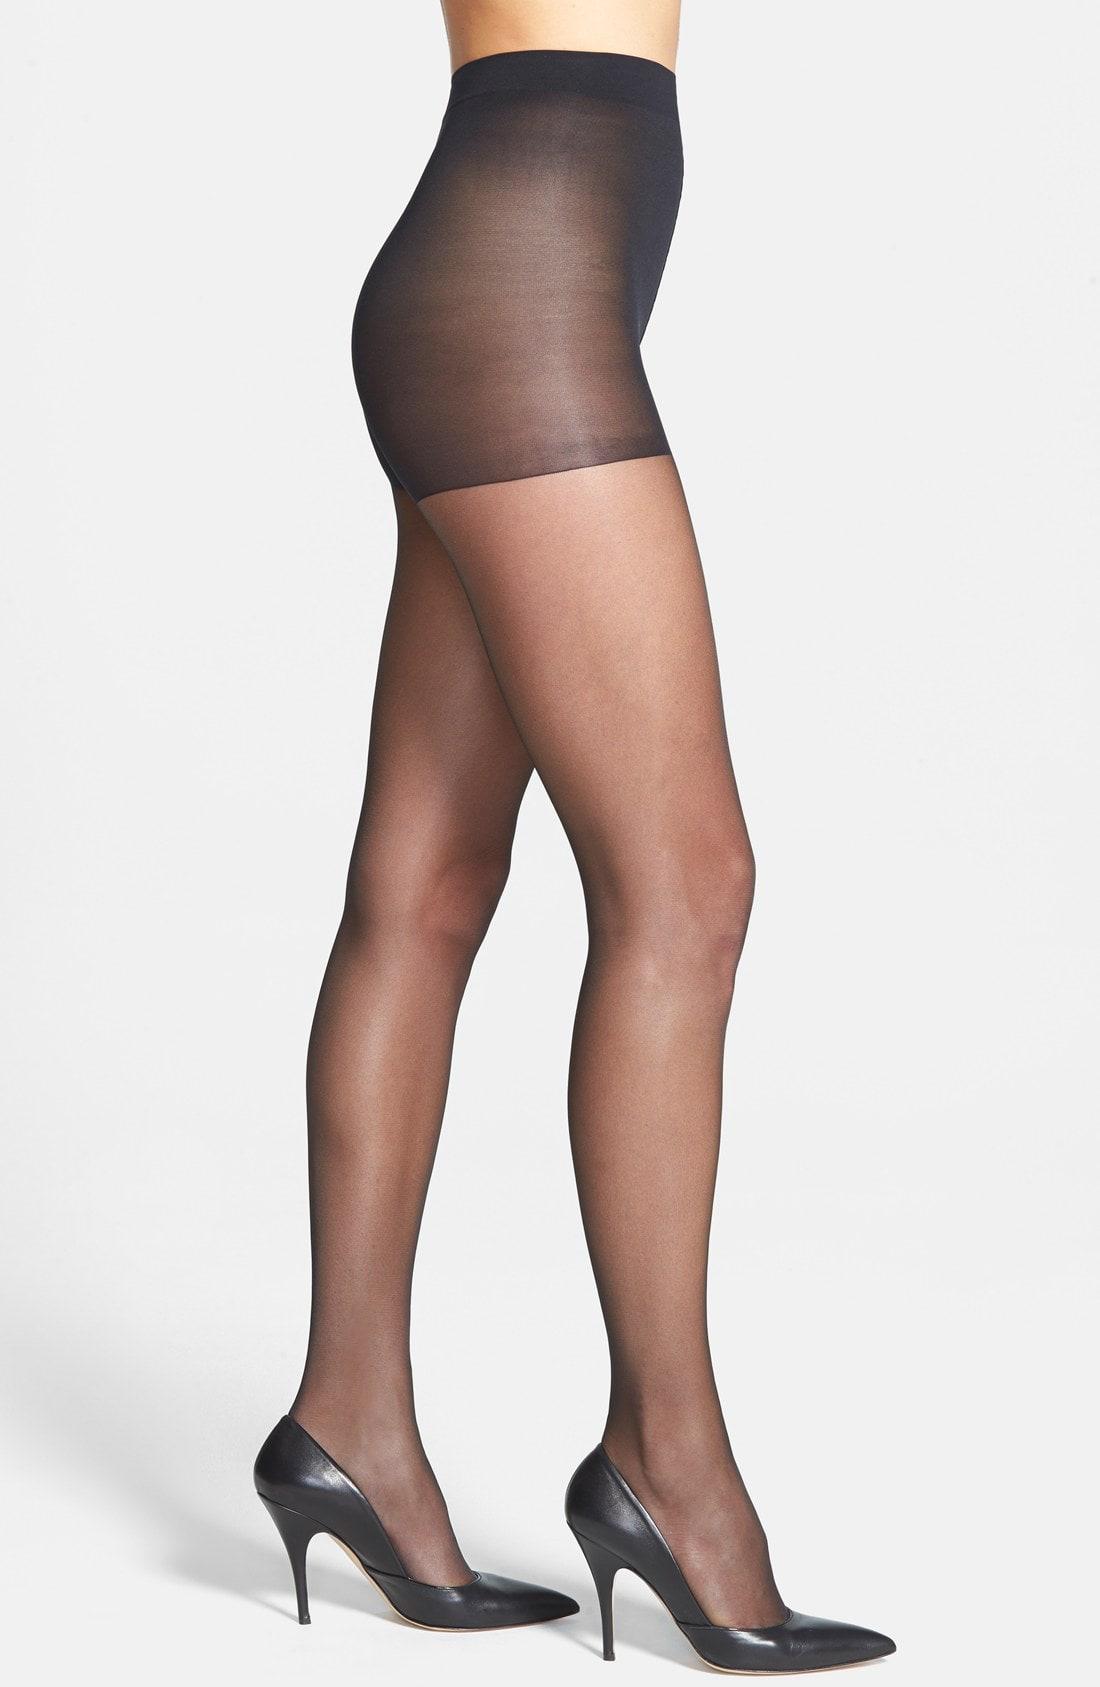 efedd47b4a9 Calvin Klein Hosiery  Sheer Essentials - Matte Ultra Sheer  Control Top  Pantyhose In Black